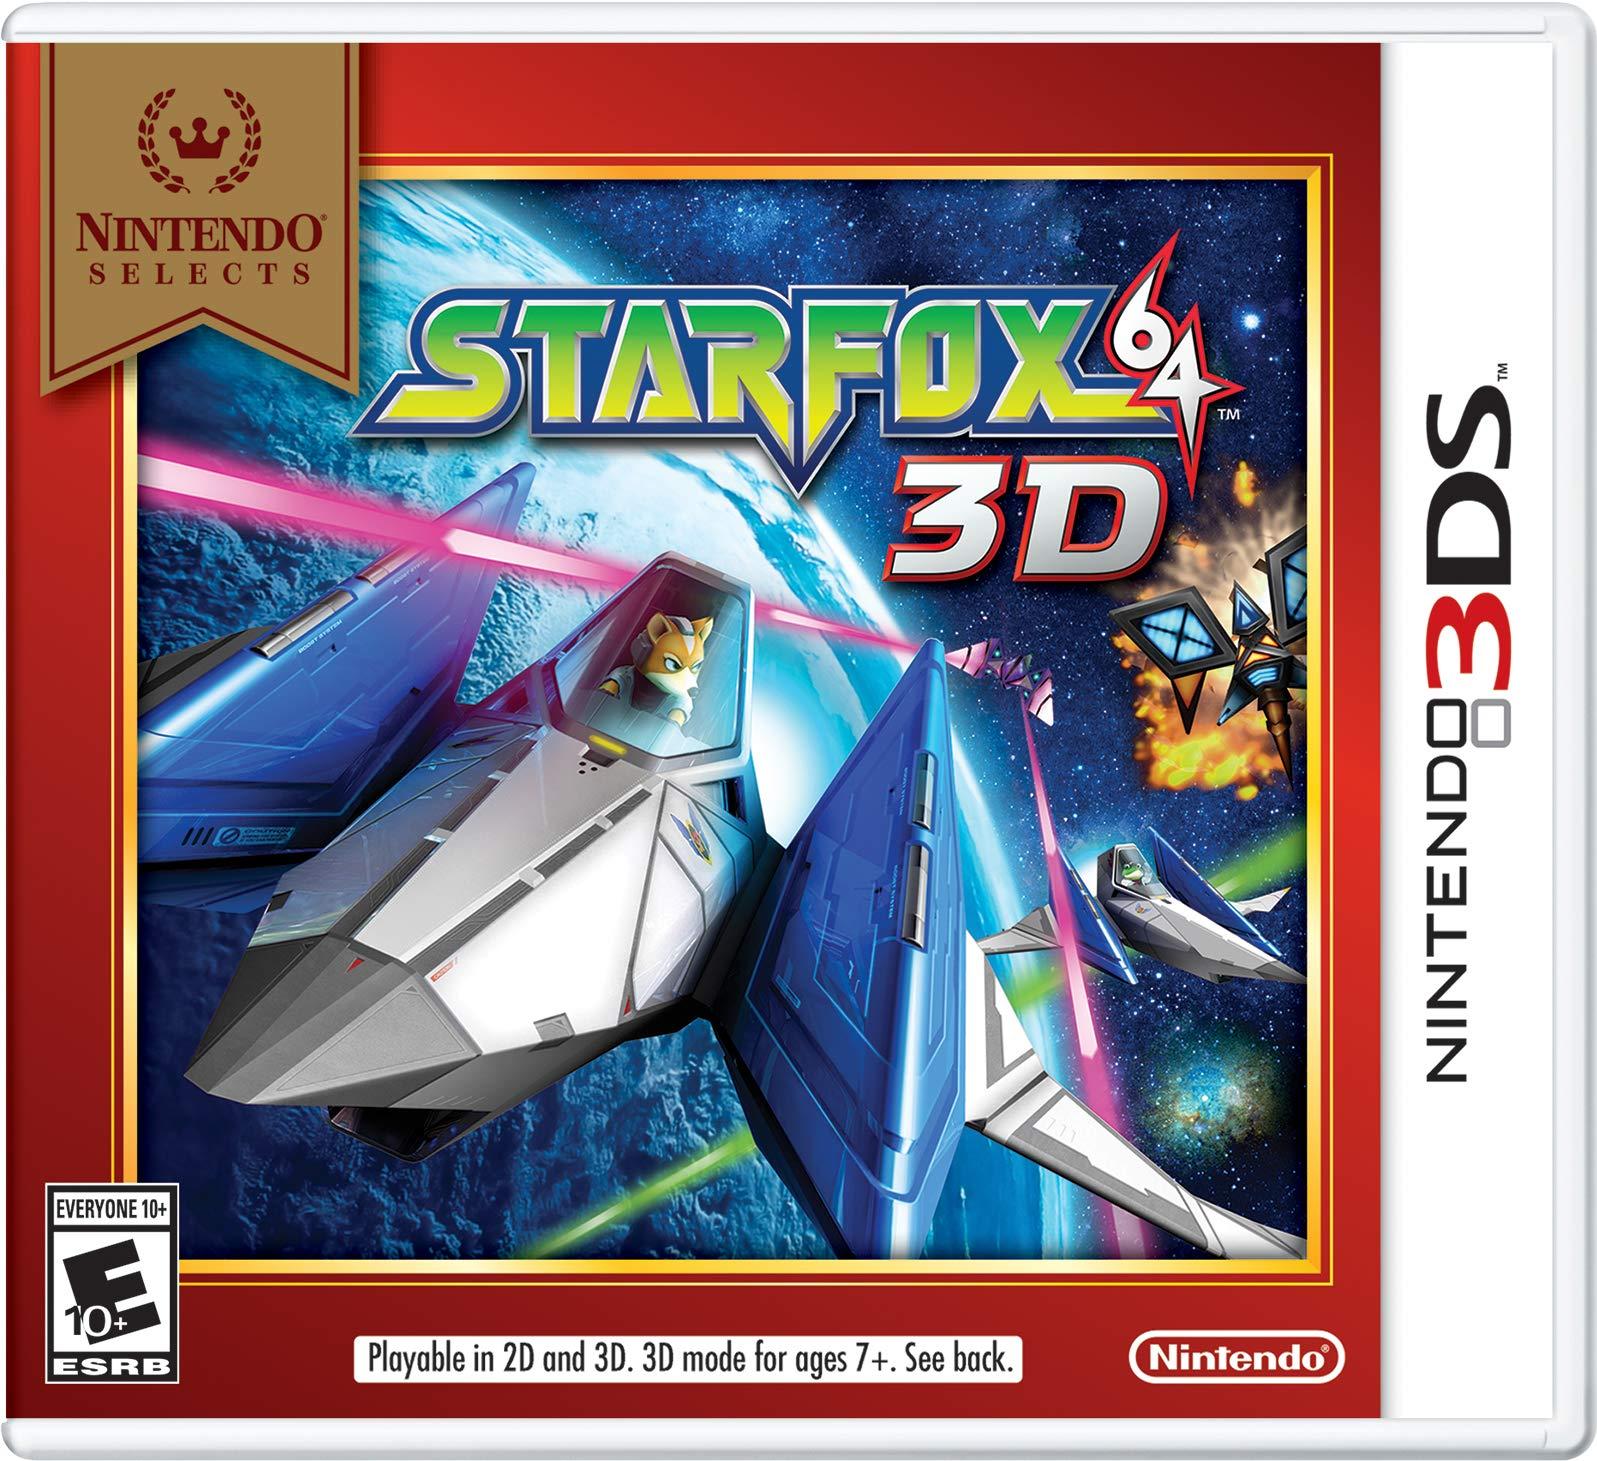 Nintendo Selects: Star Fox 64 3D - Nintendo 3DS